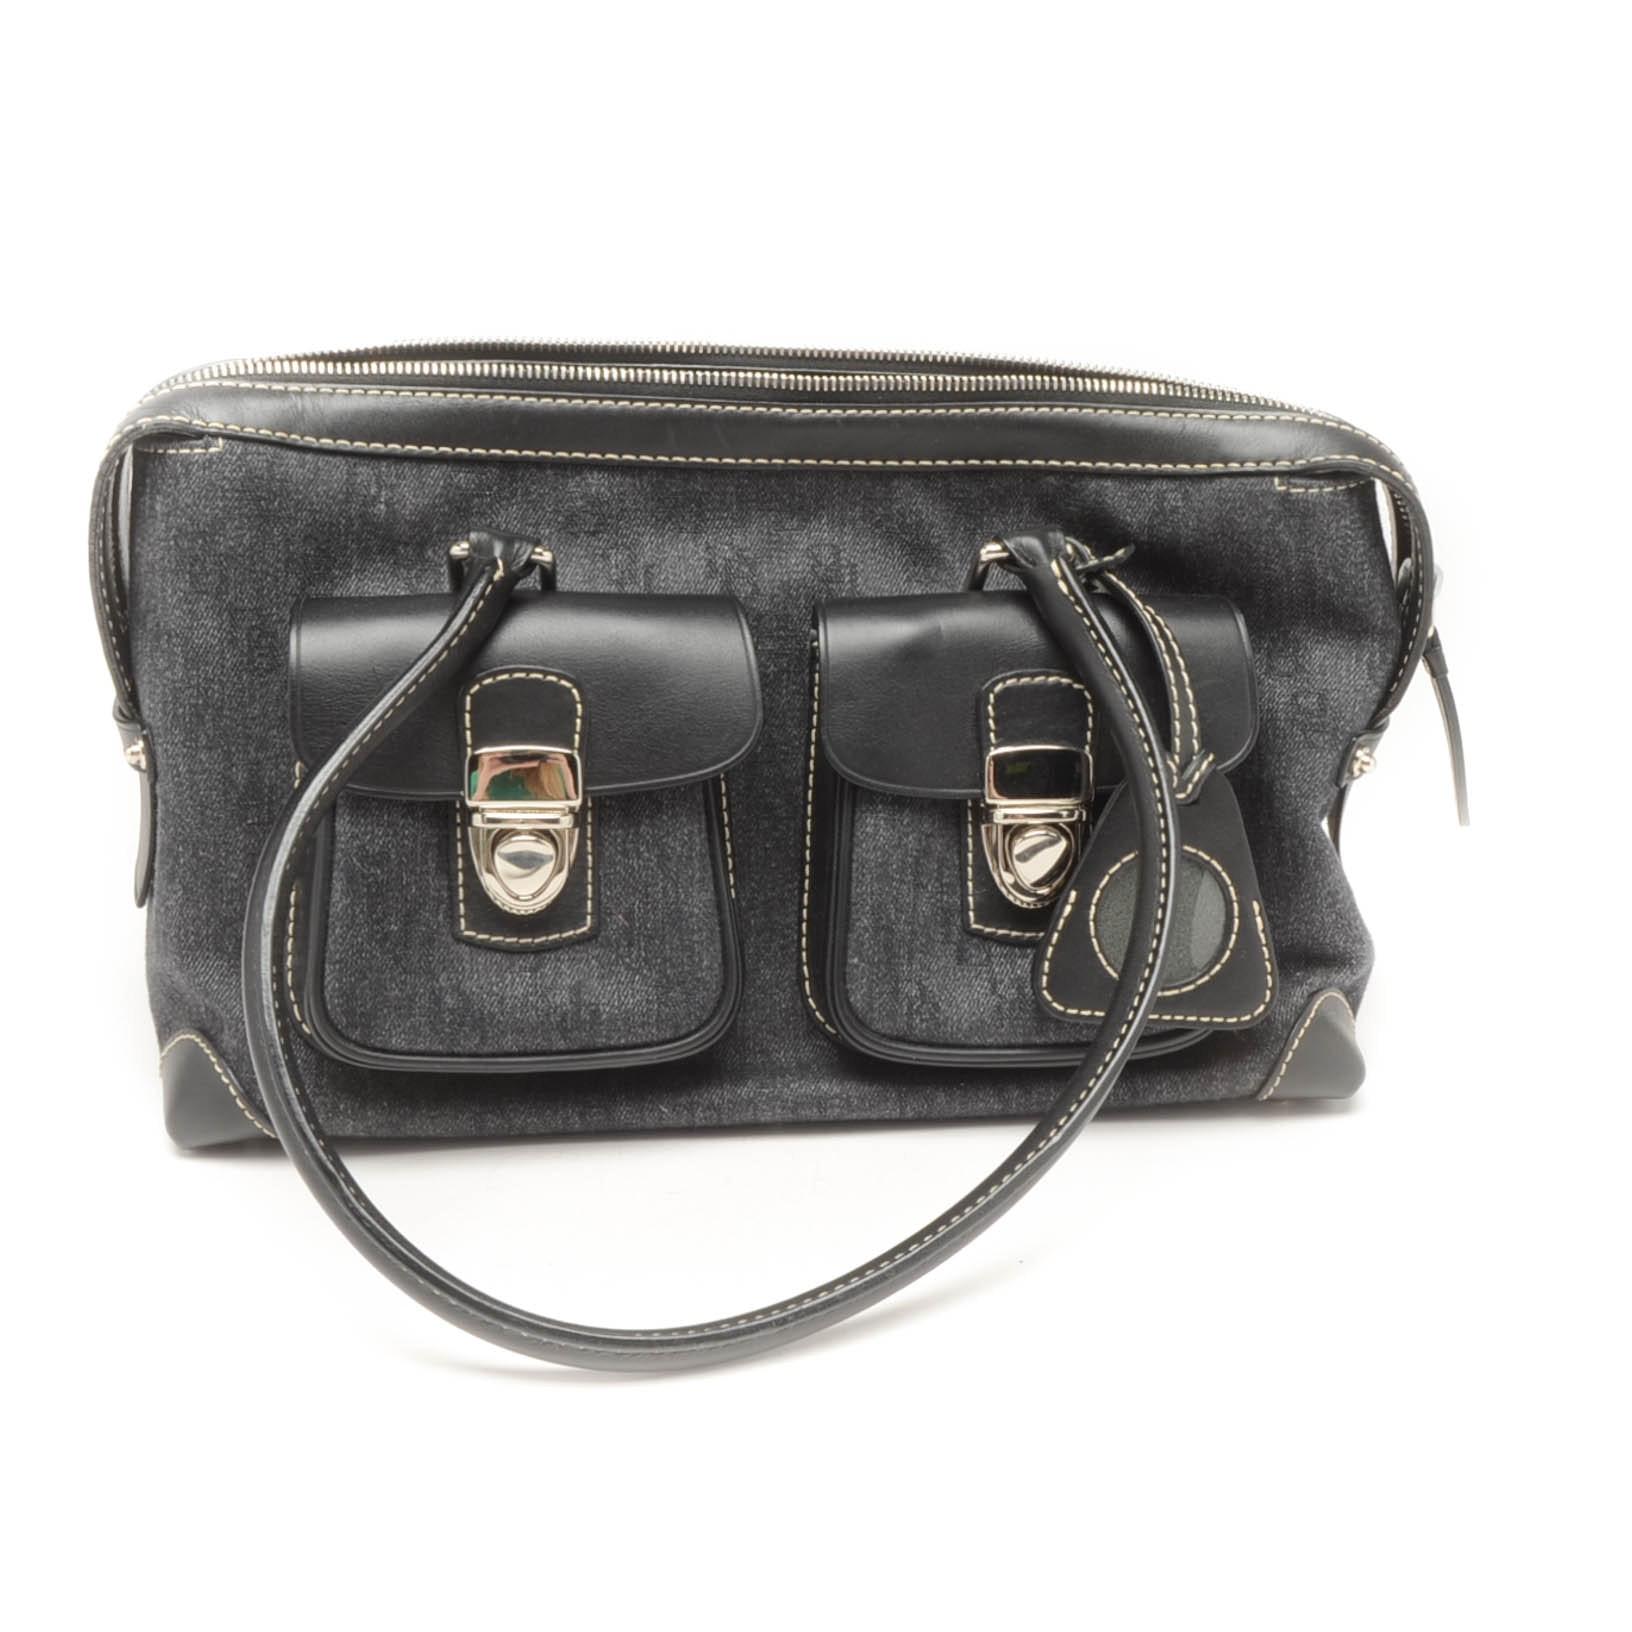 Dooney & Bourke Charcoal Denim and Black Leather Satchel